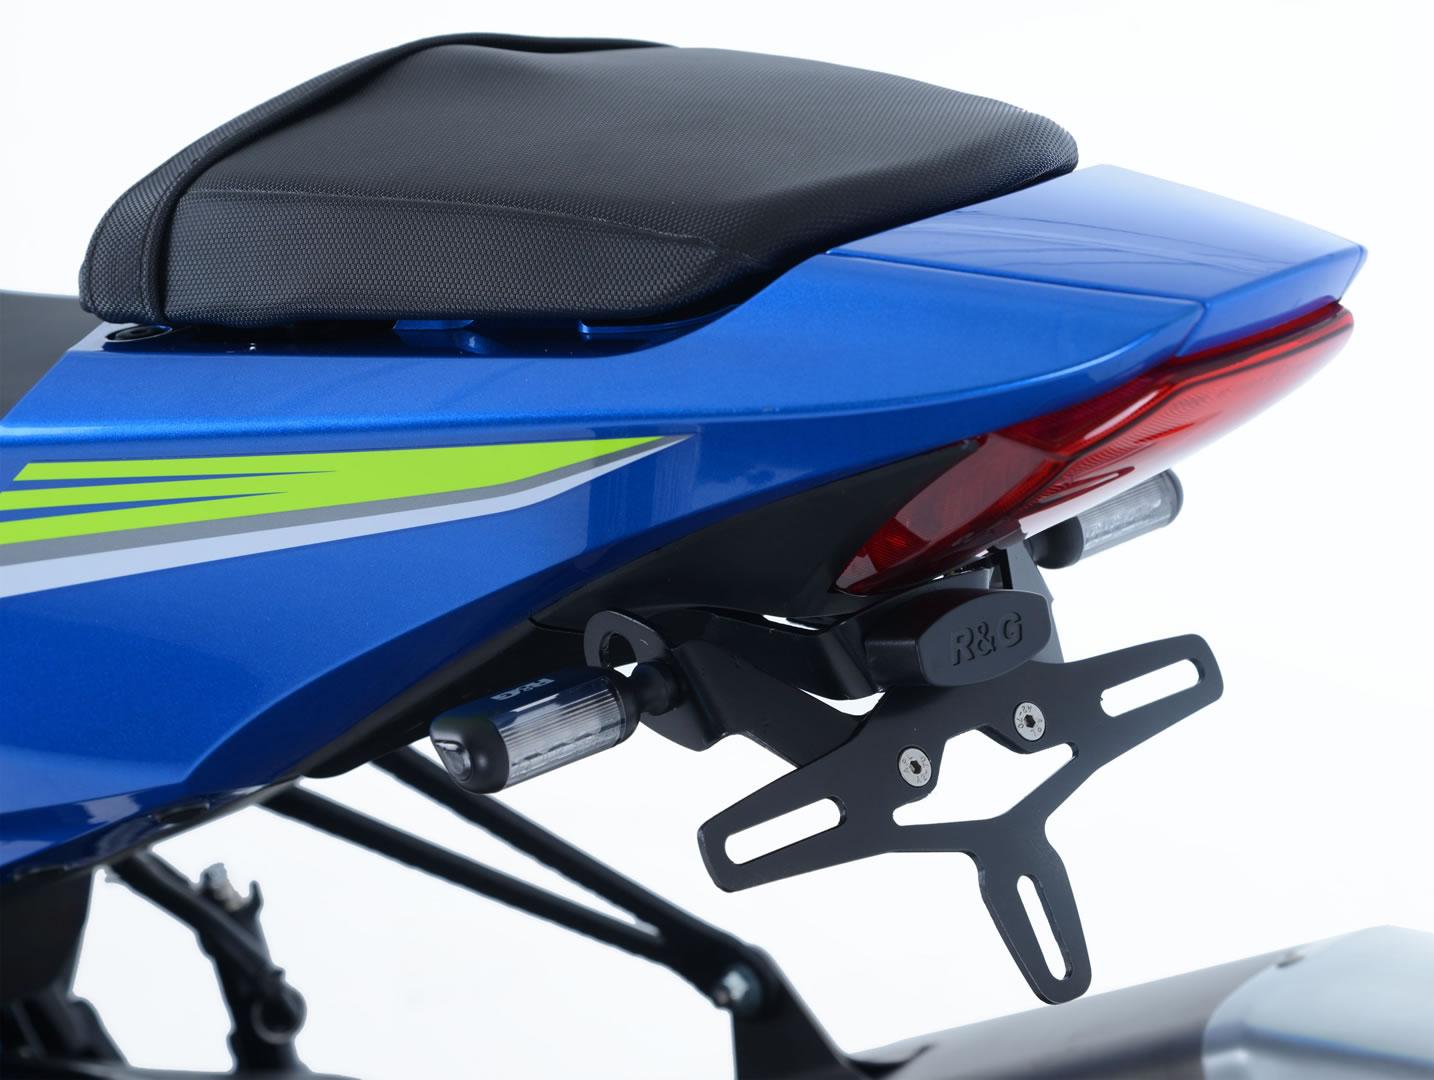 Tail Tidy Fender Eliminator Suzuki Gsx150 Daftar Harga Terbaru Dan Gsx R S 150 Undertail Street Rg For R1000 17